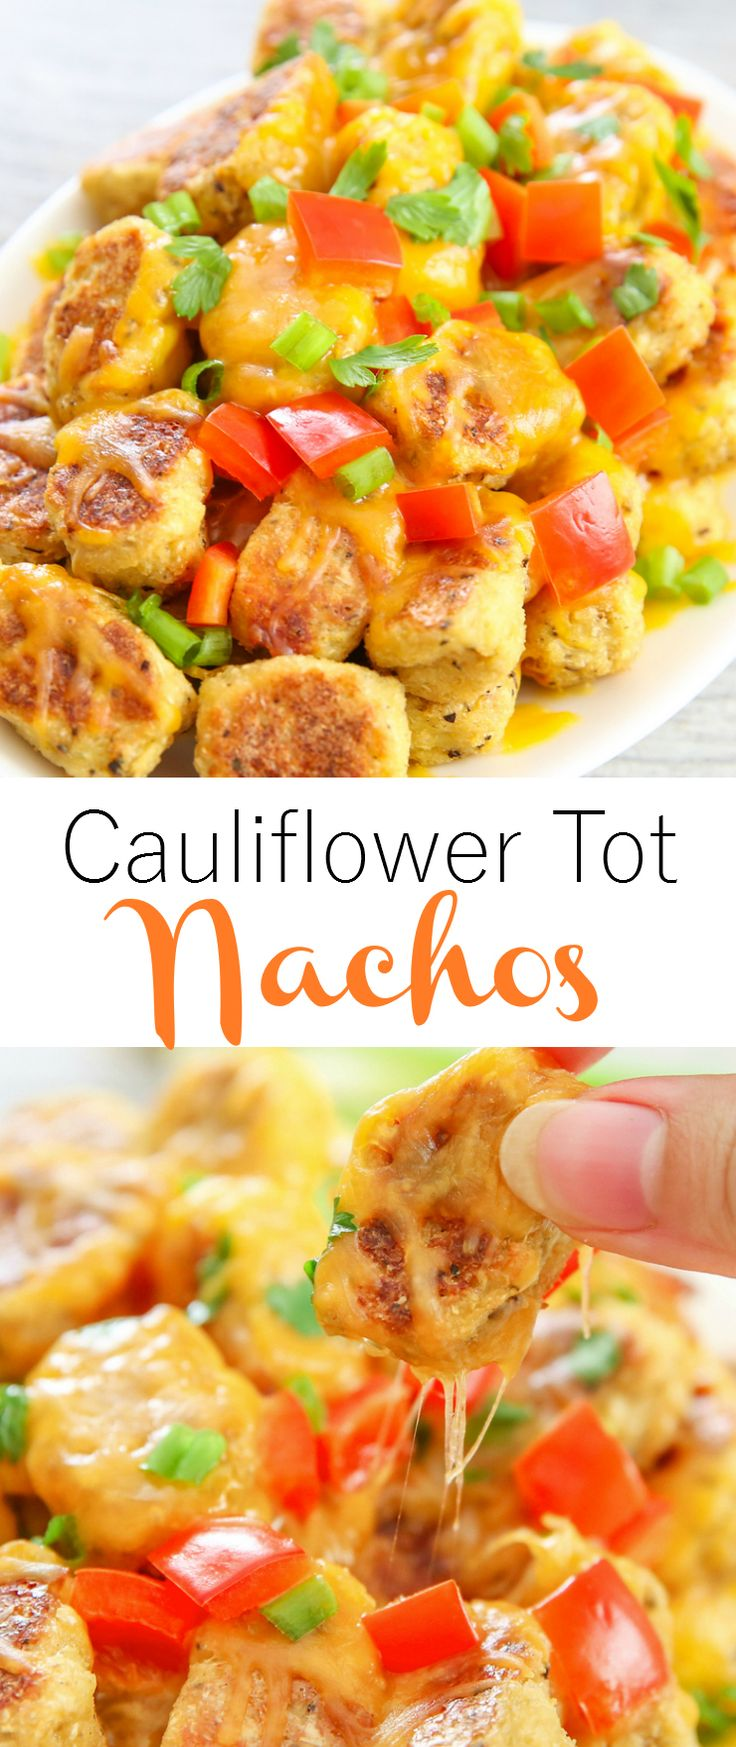 Cauliflower Tot Nachos | Kirbie's Cravings | A San Diego food & travel blog